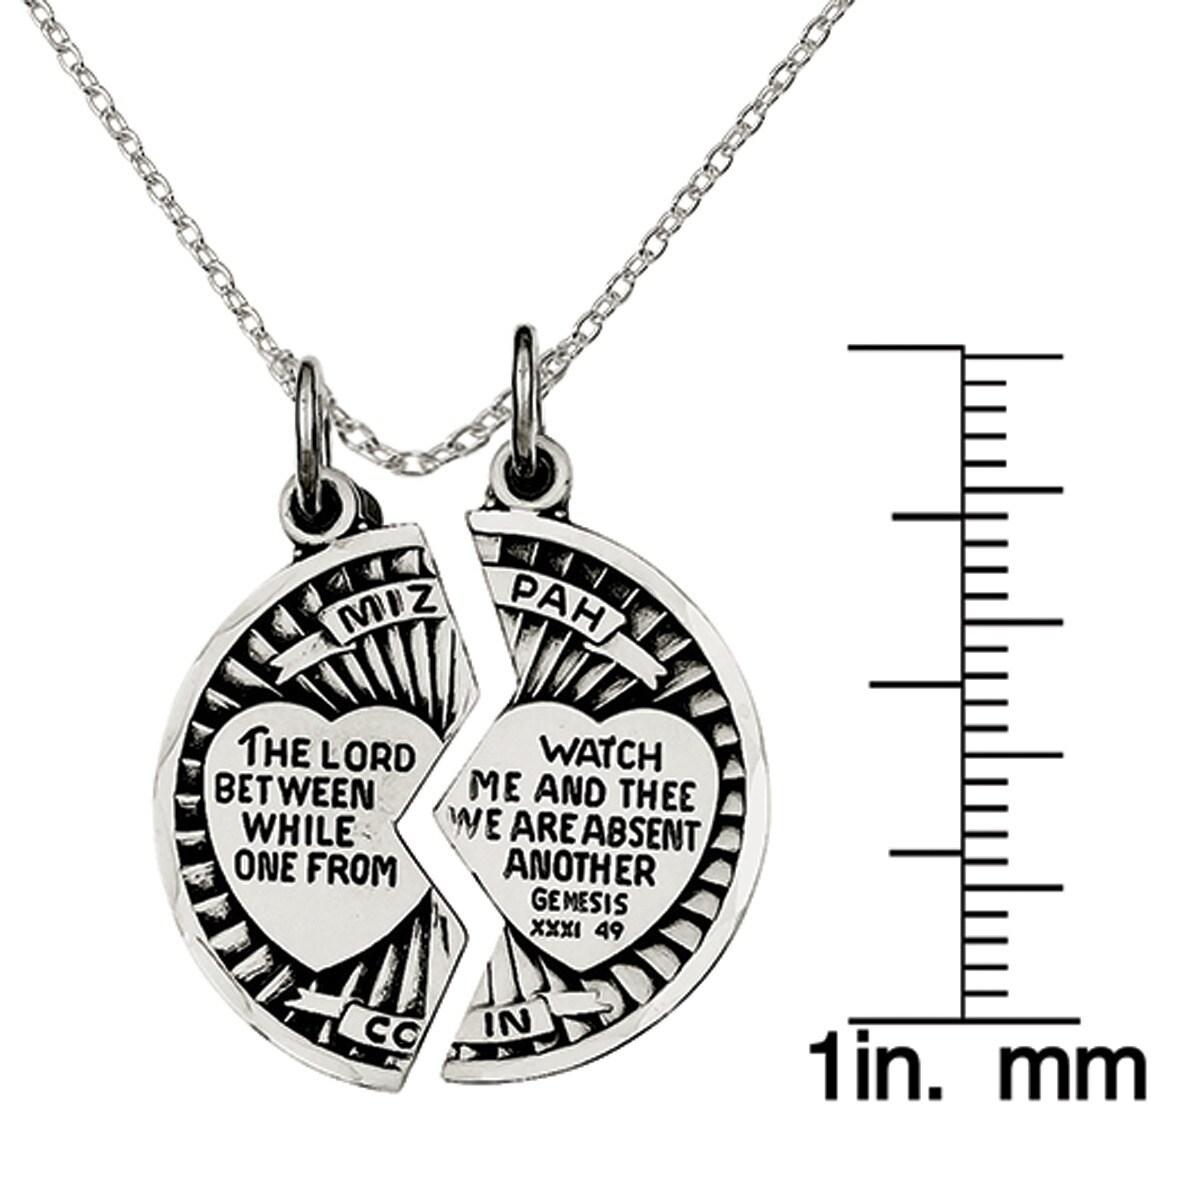 Sterling silver satin antiqued 2 piece mizpah pendant with 18 chain sterling silver satin antiqued 2 piece mizpah pendant with 18 chain free shipping today overstock 21213966 aloadofball Choice Image